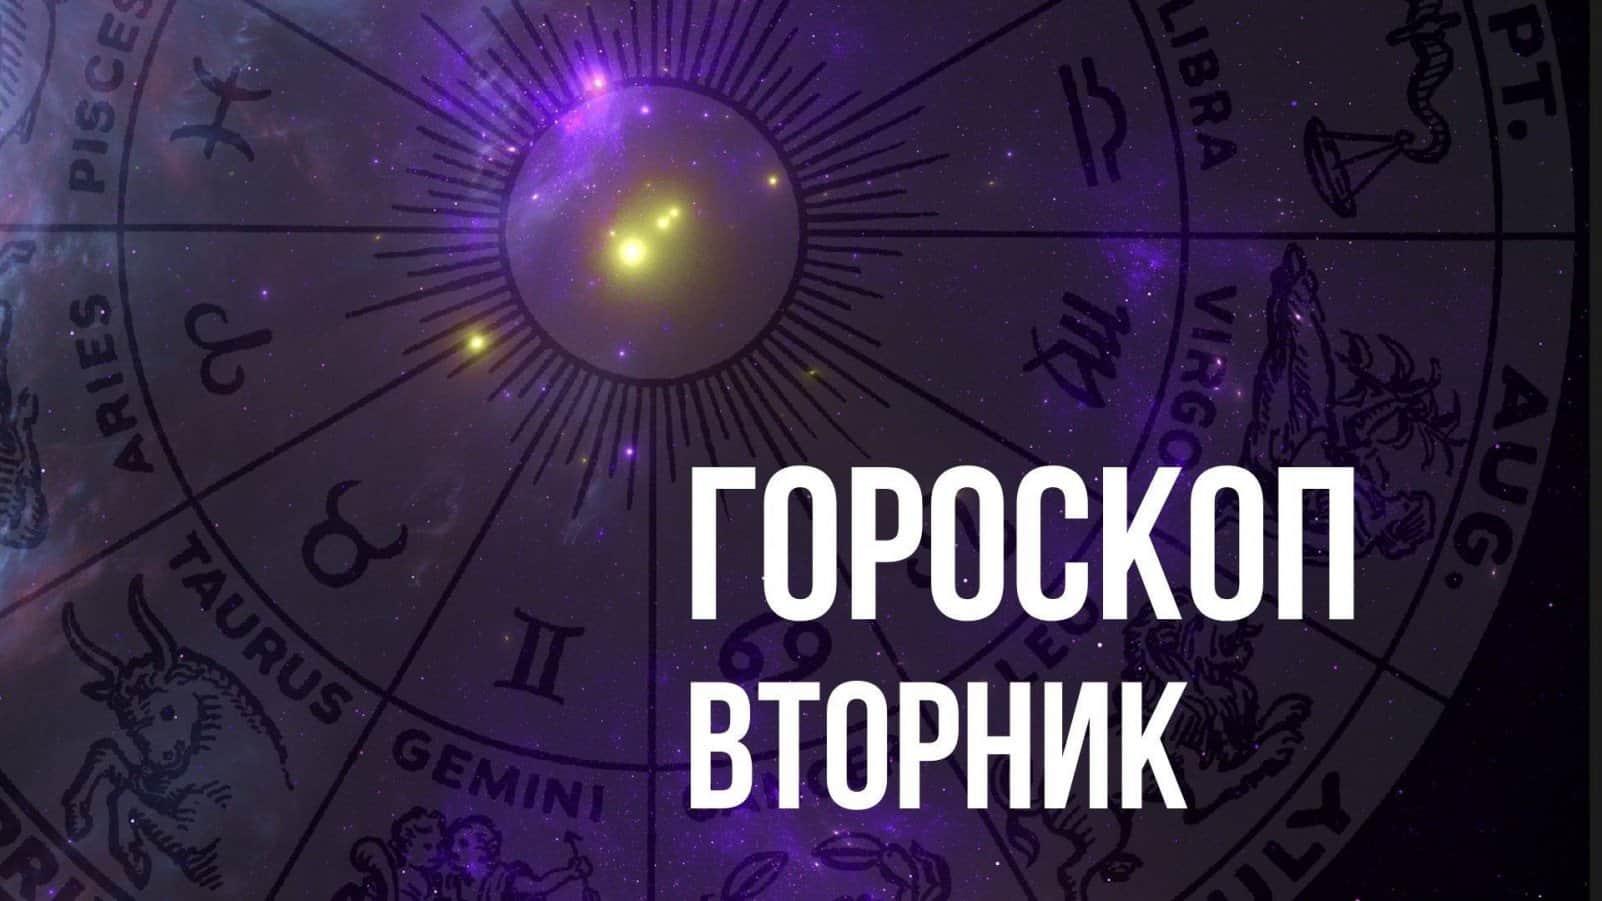 Гороскоп на вторник 30 марта для каждого знака Зодиака